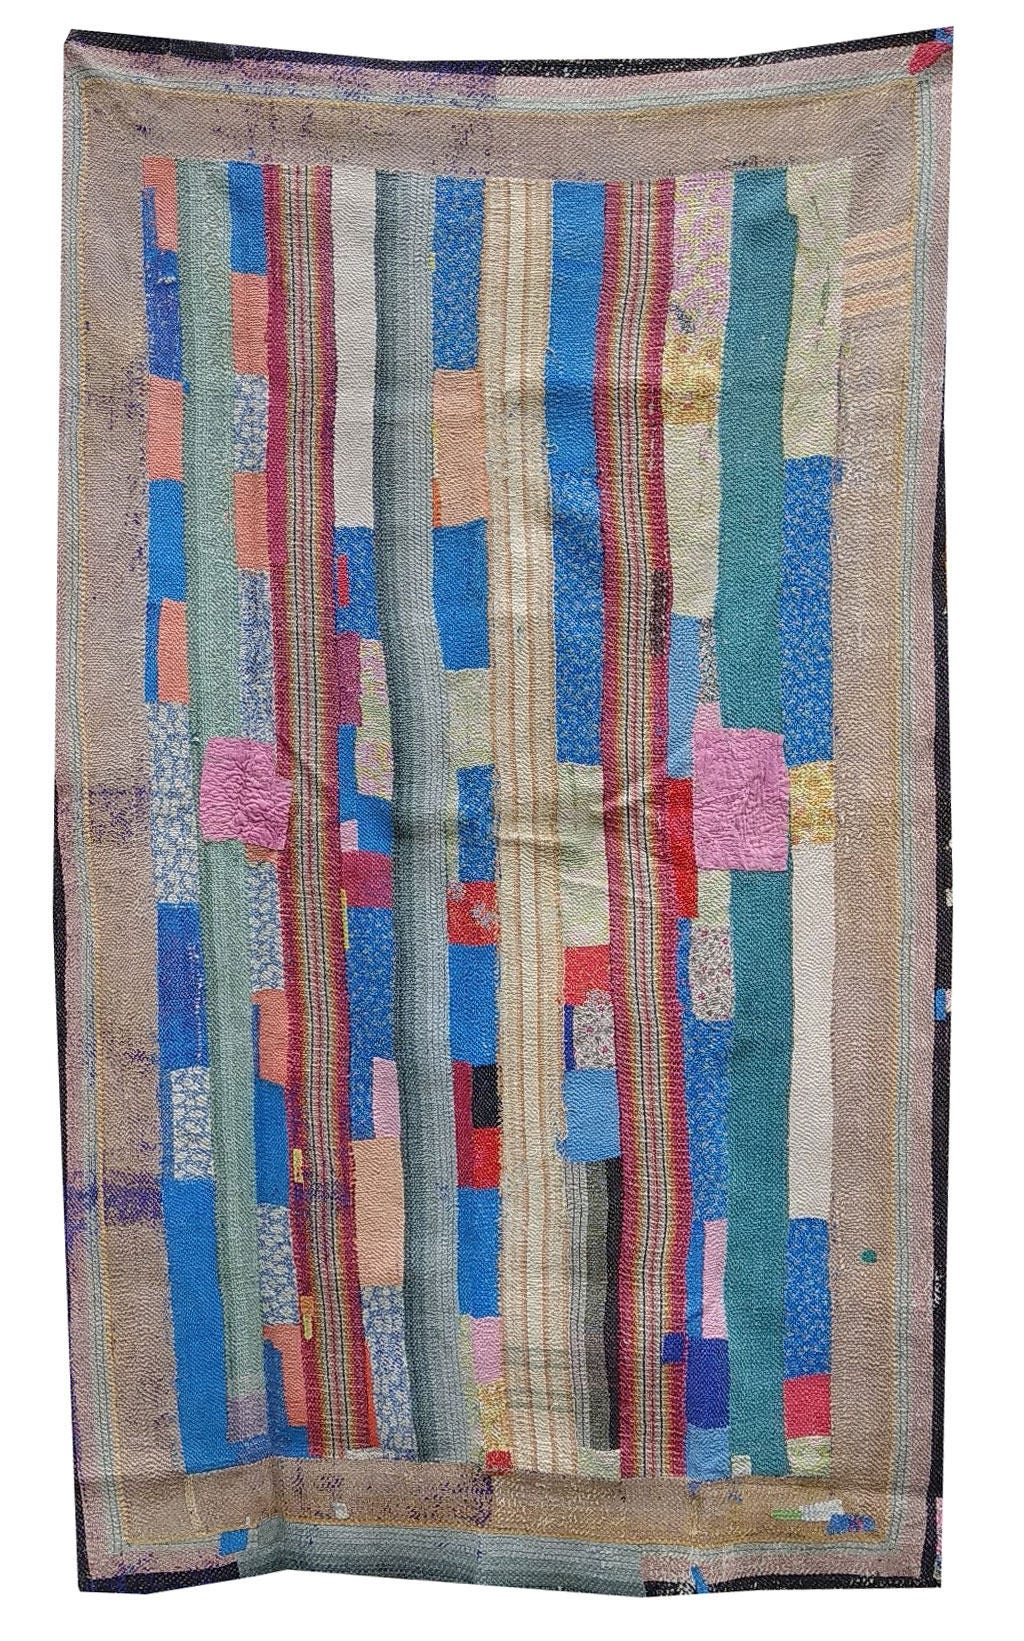 Vintage Exclusive Beige  Blue Kantha Embroidery Reversible QuiltKantha Bedspread Indian Blanket Kantha Throw Coverlet Decorative Throw